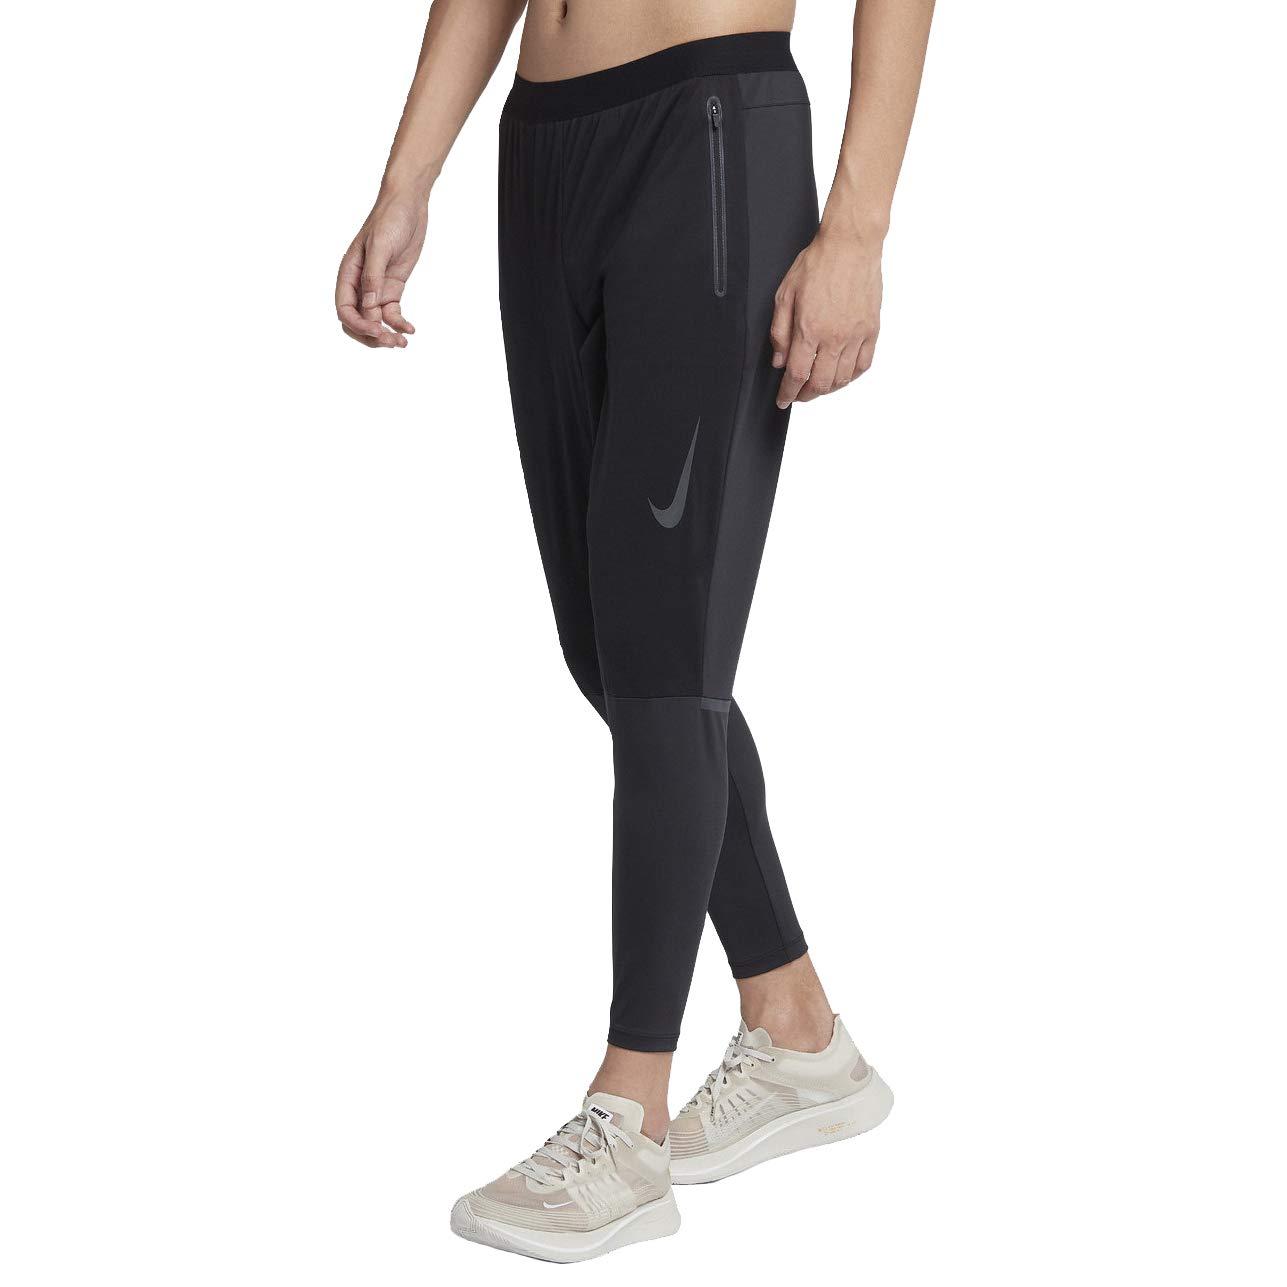 Noir, noir XL Nike Shield Swift Pantalon Homme